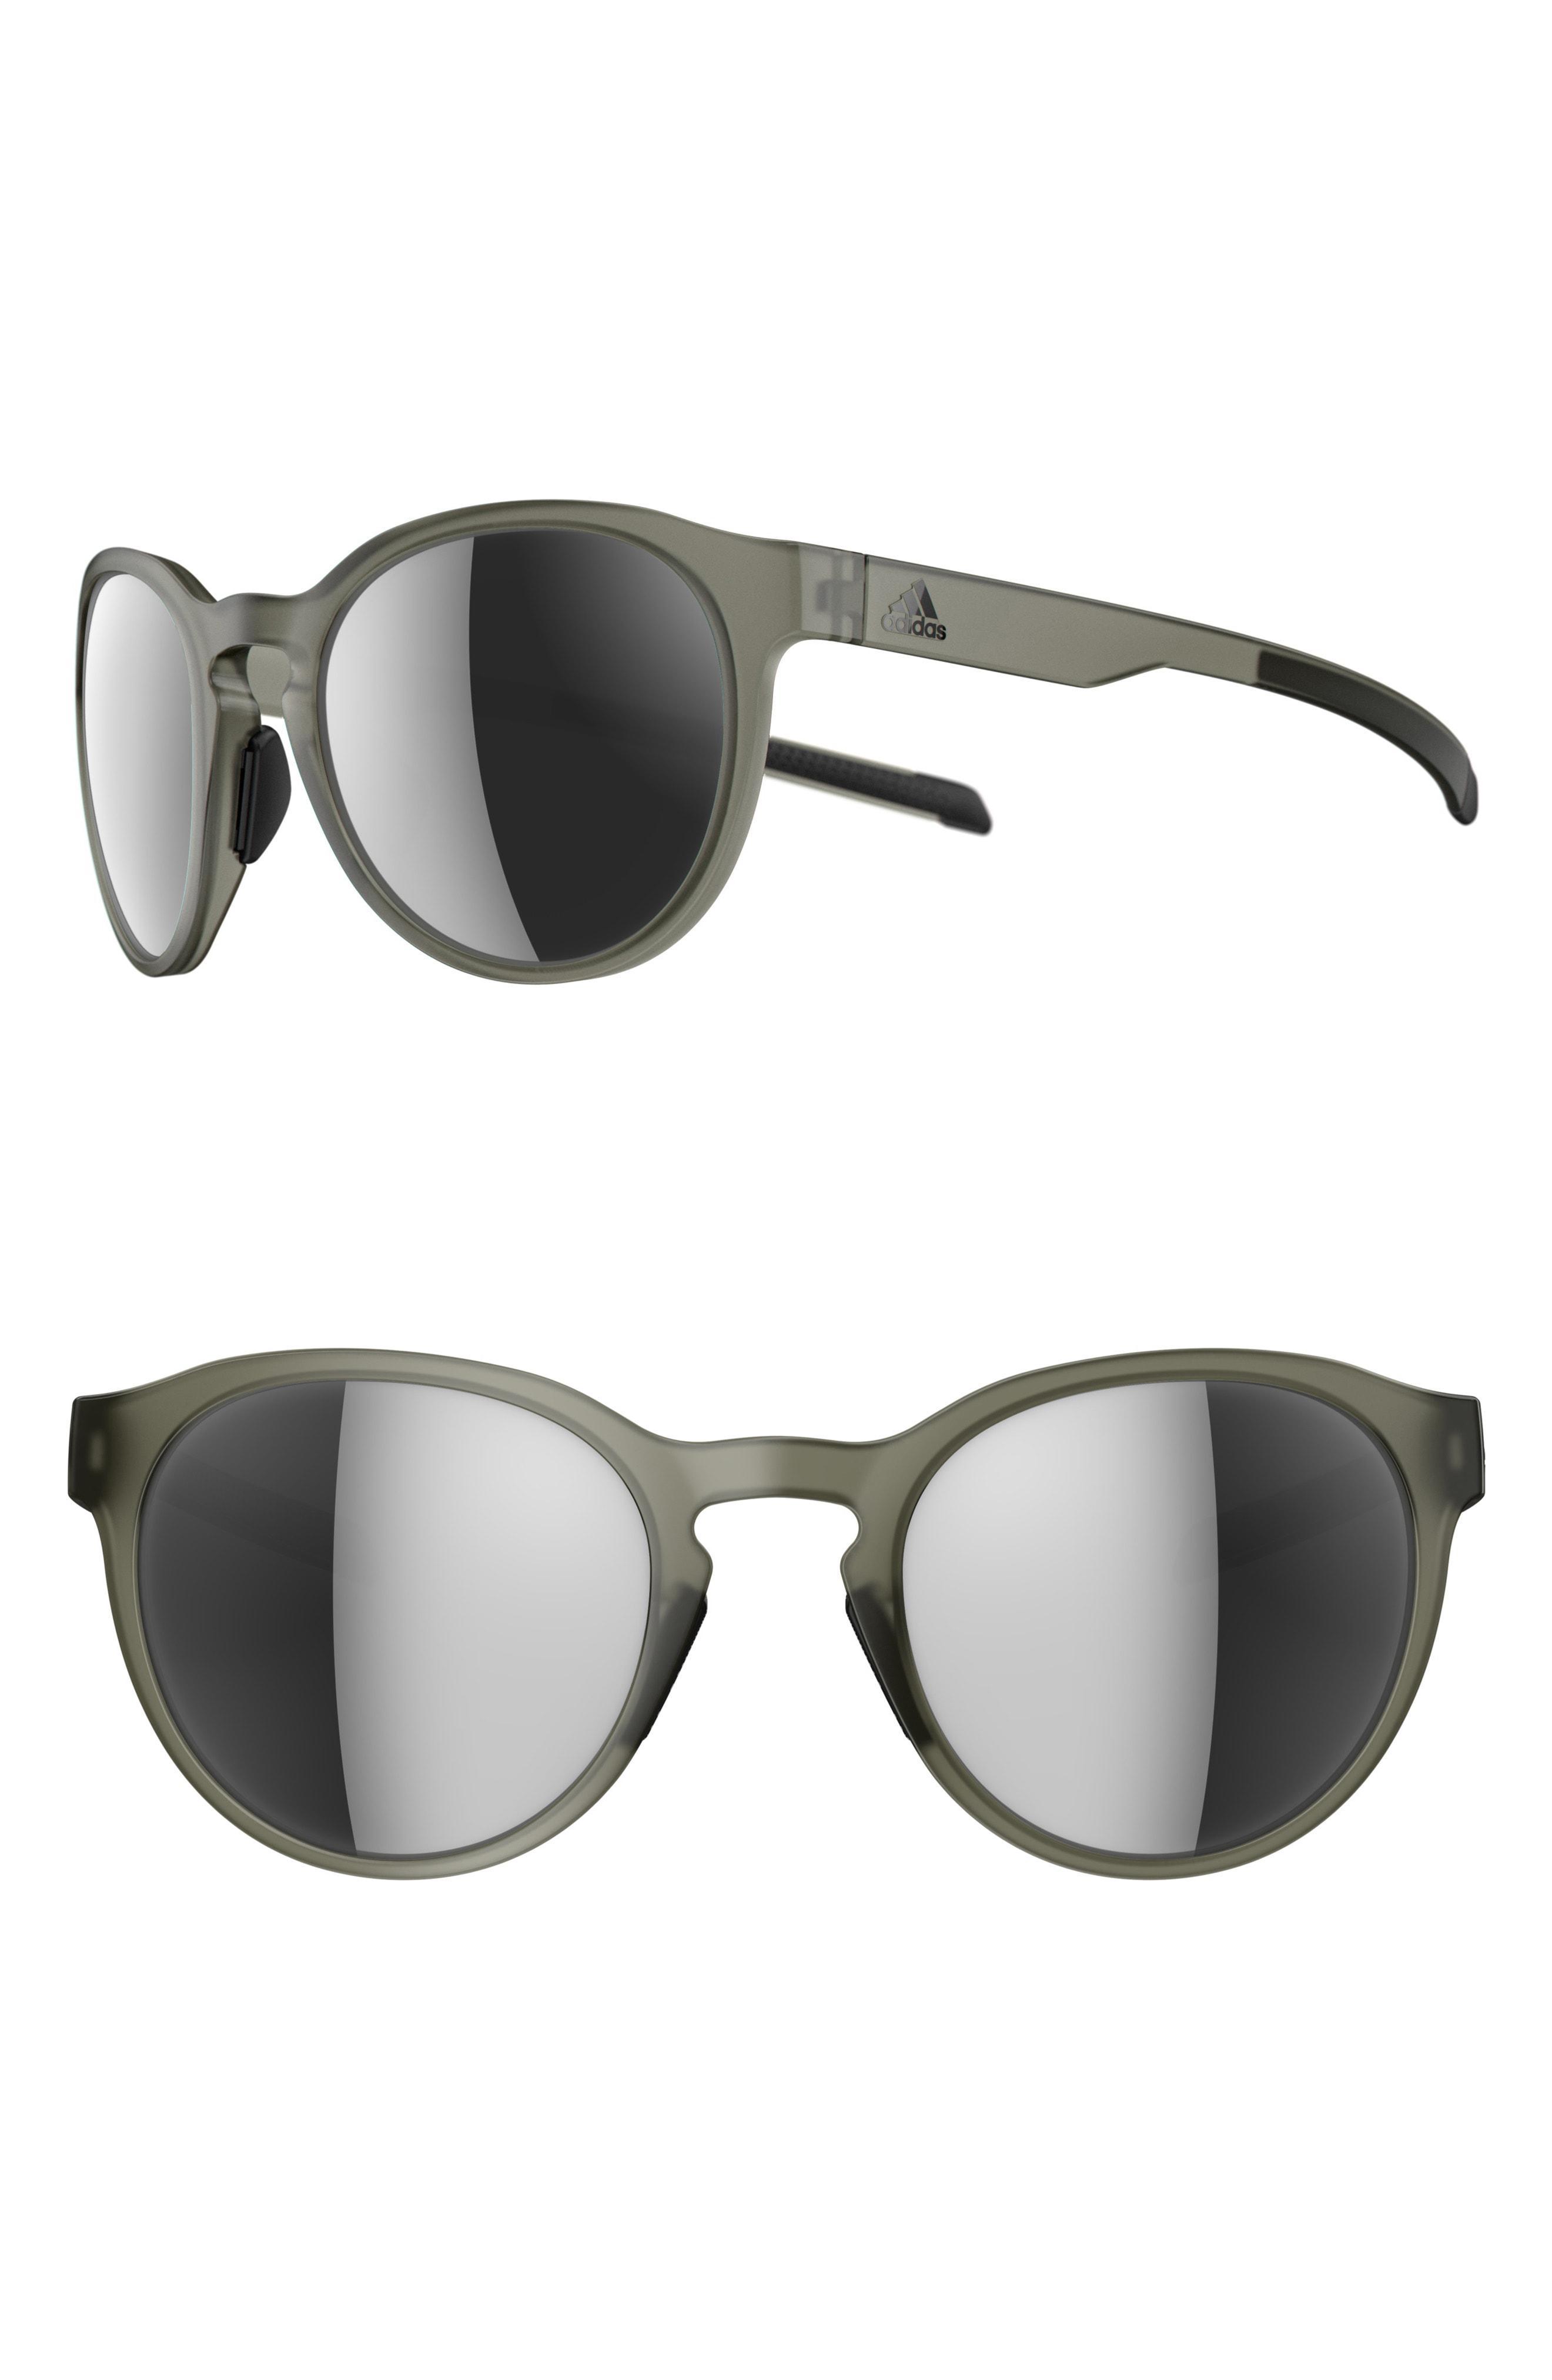 8c1ee6accf Adidas matte olive chrome proshift mirrored sport sunglasses jpg 2640x4048  Olive mirrored aviators